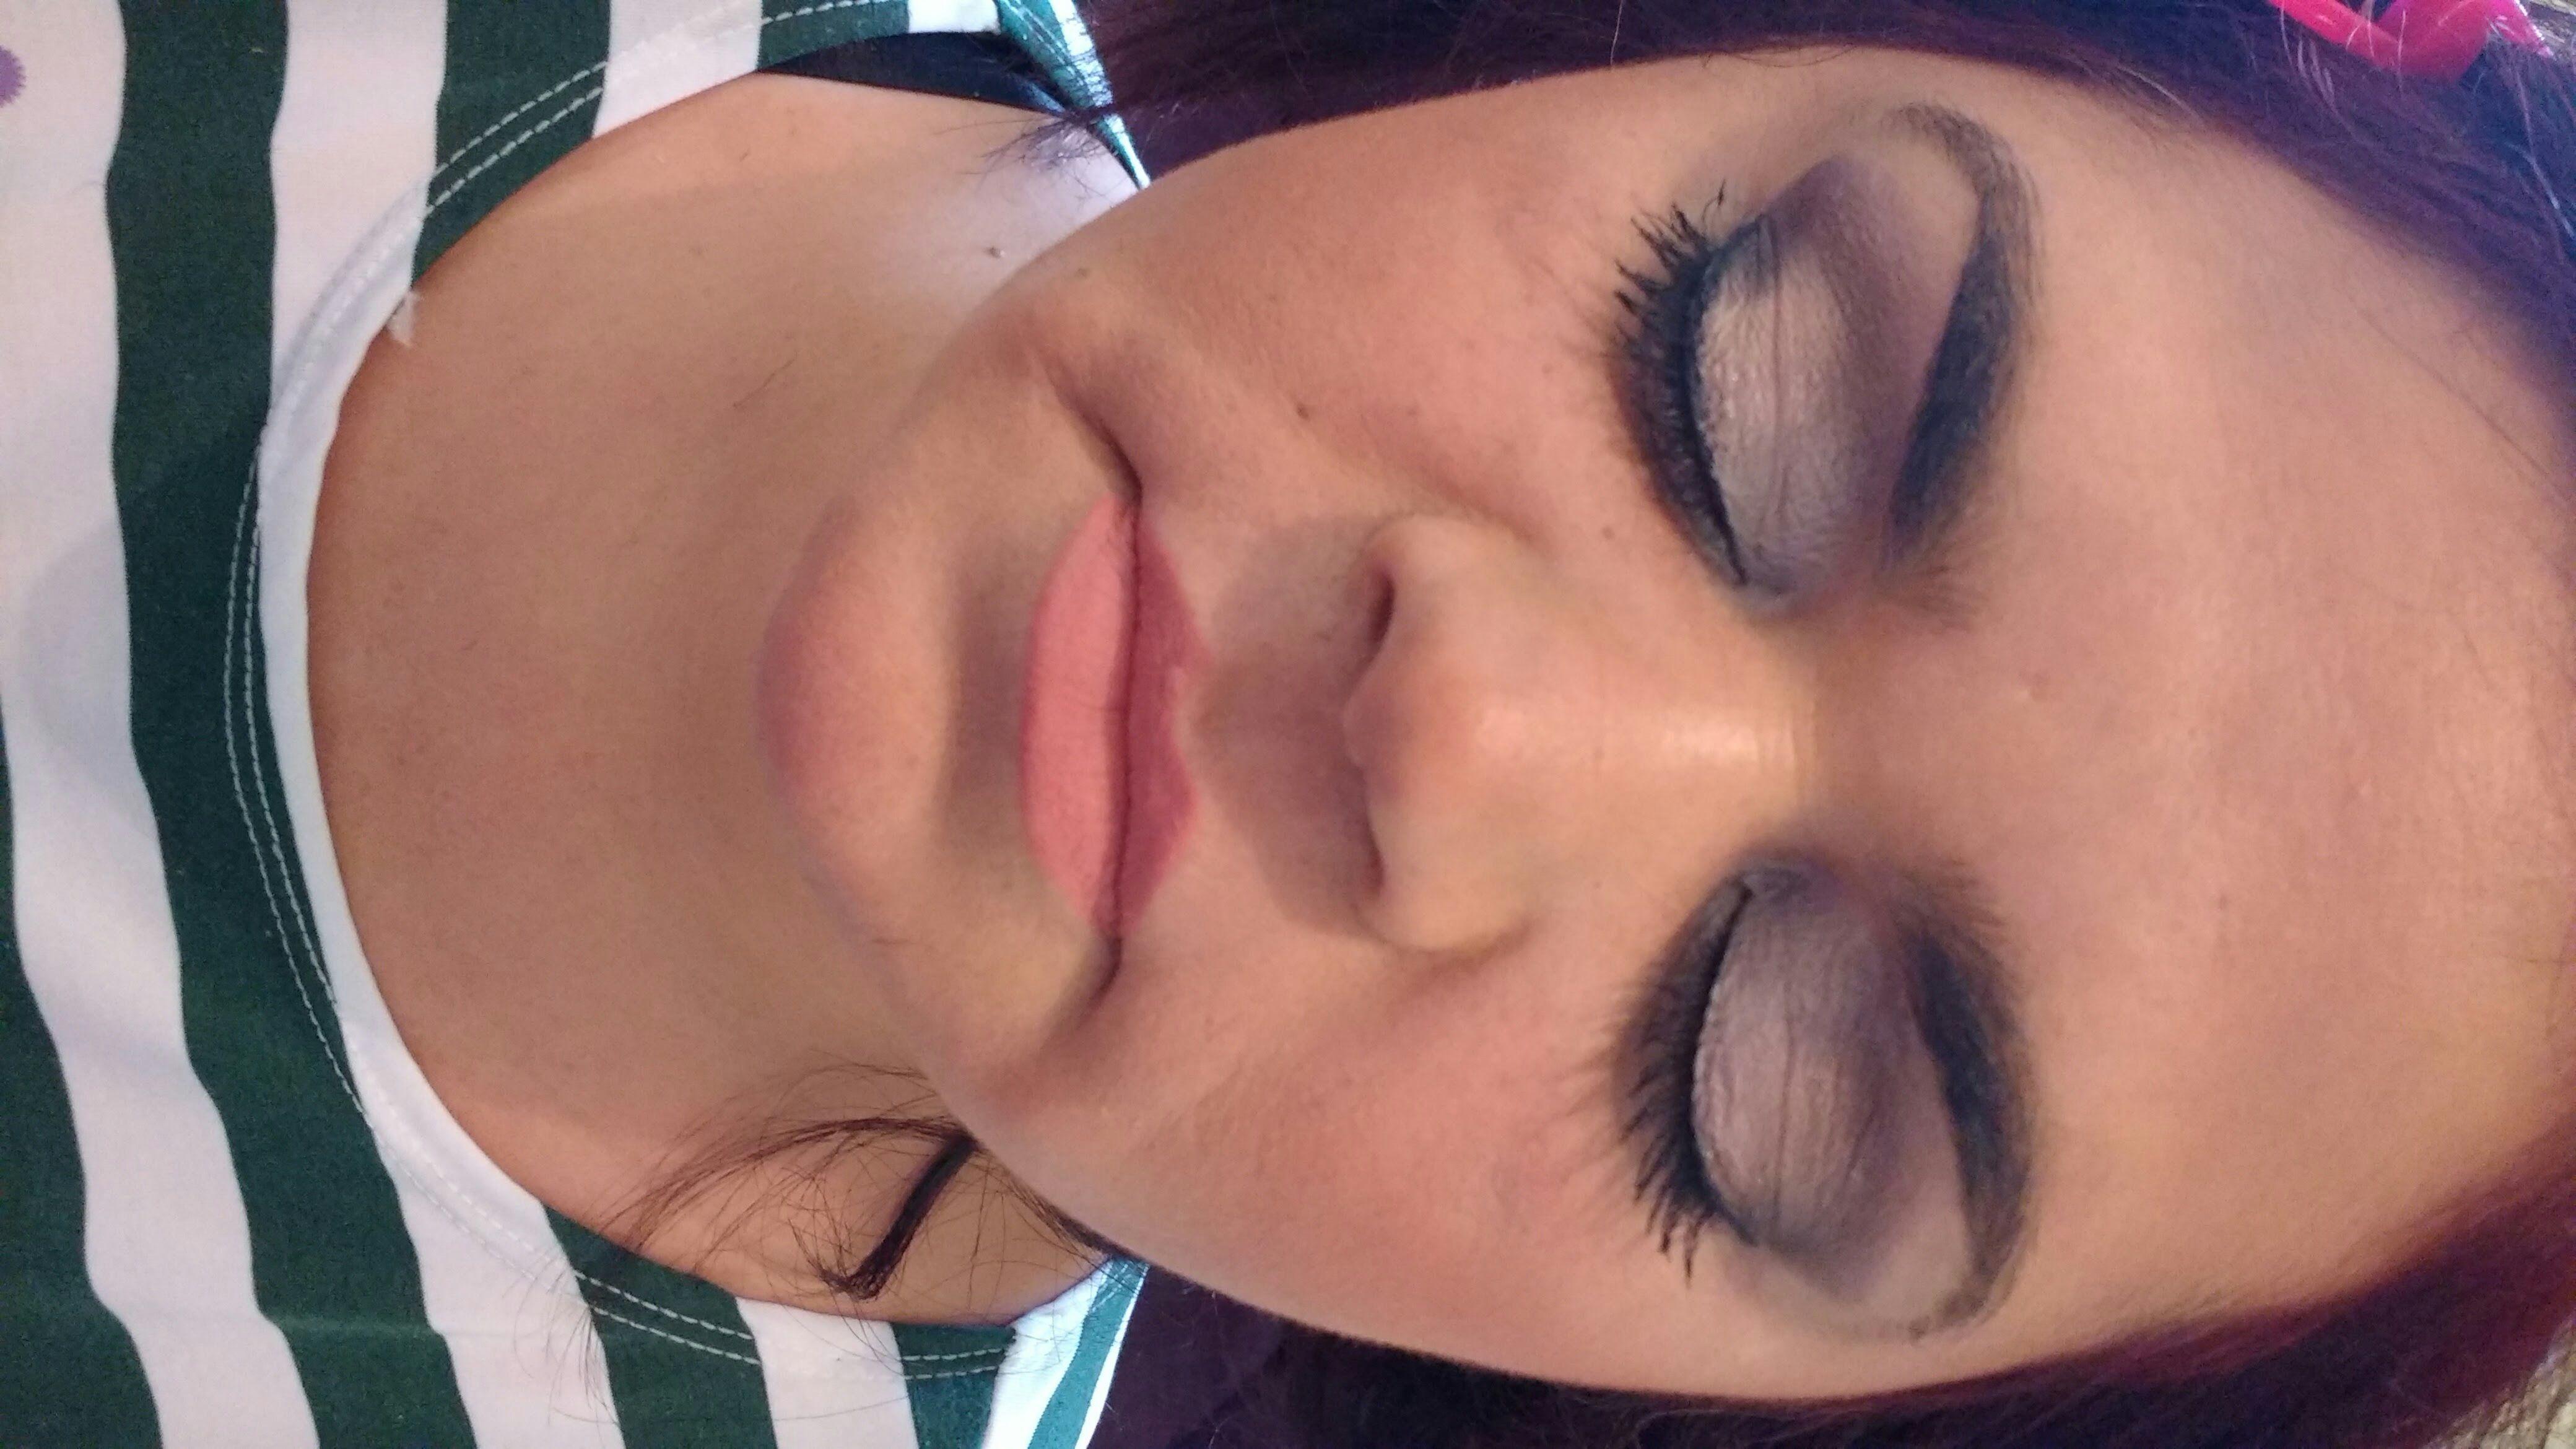 maquiagem cabeleireiro(a) manicure e pedicure manicure e pedicure